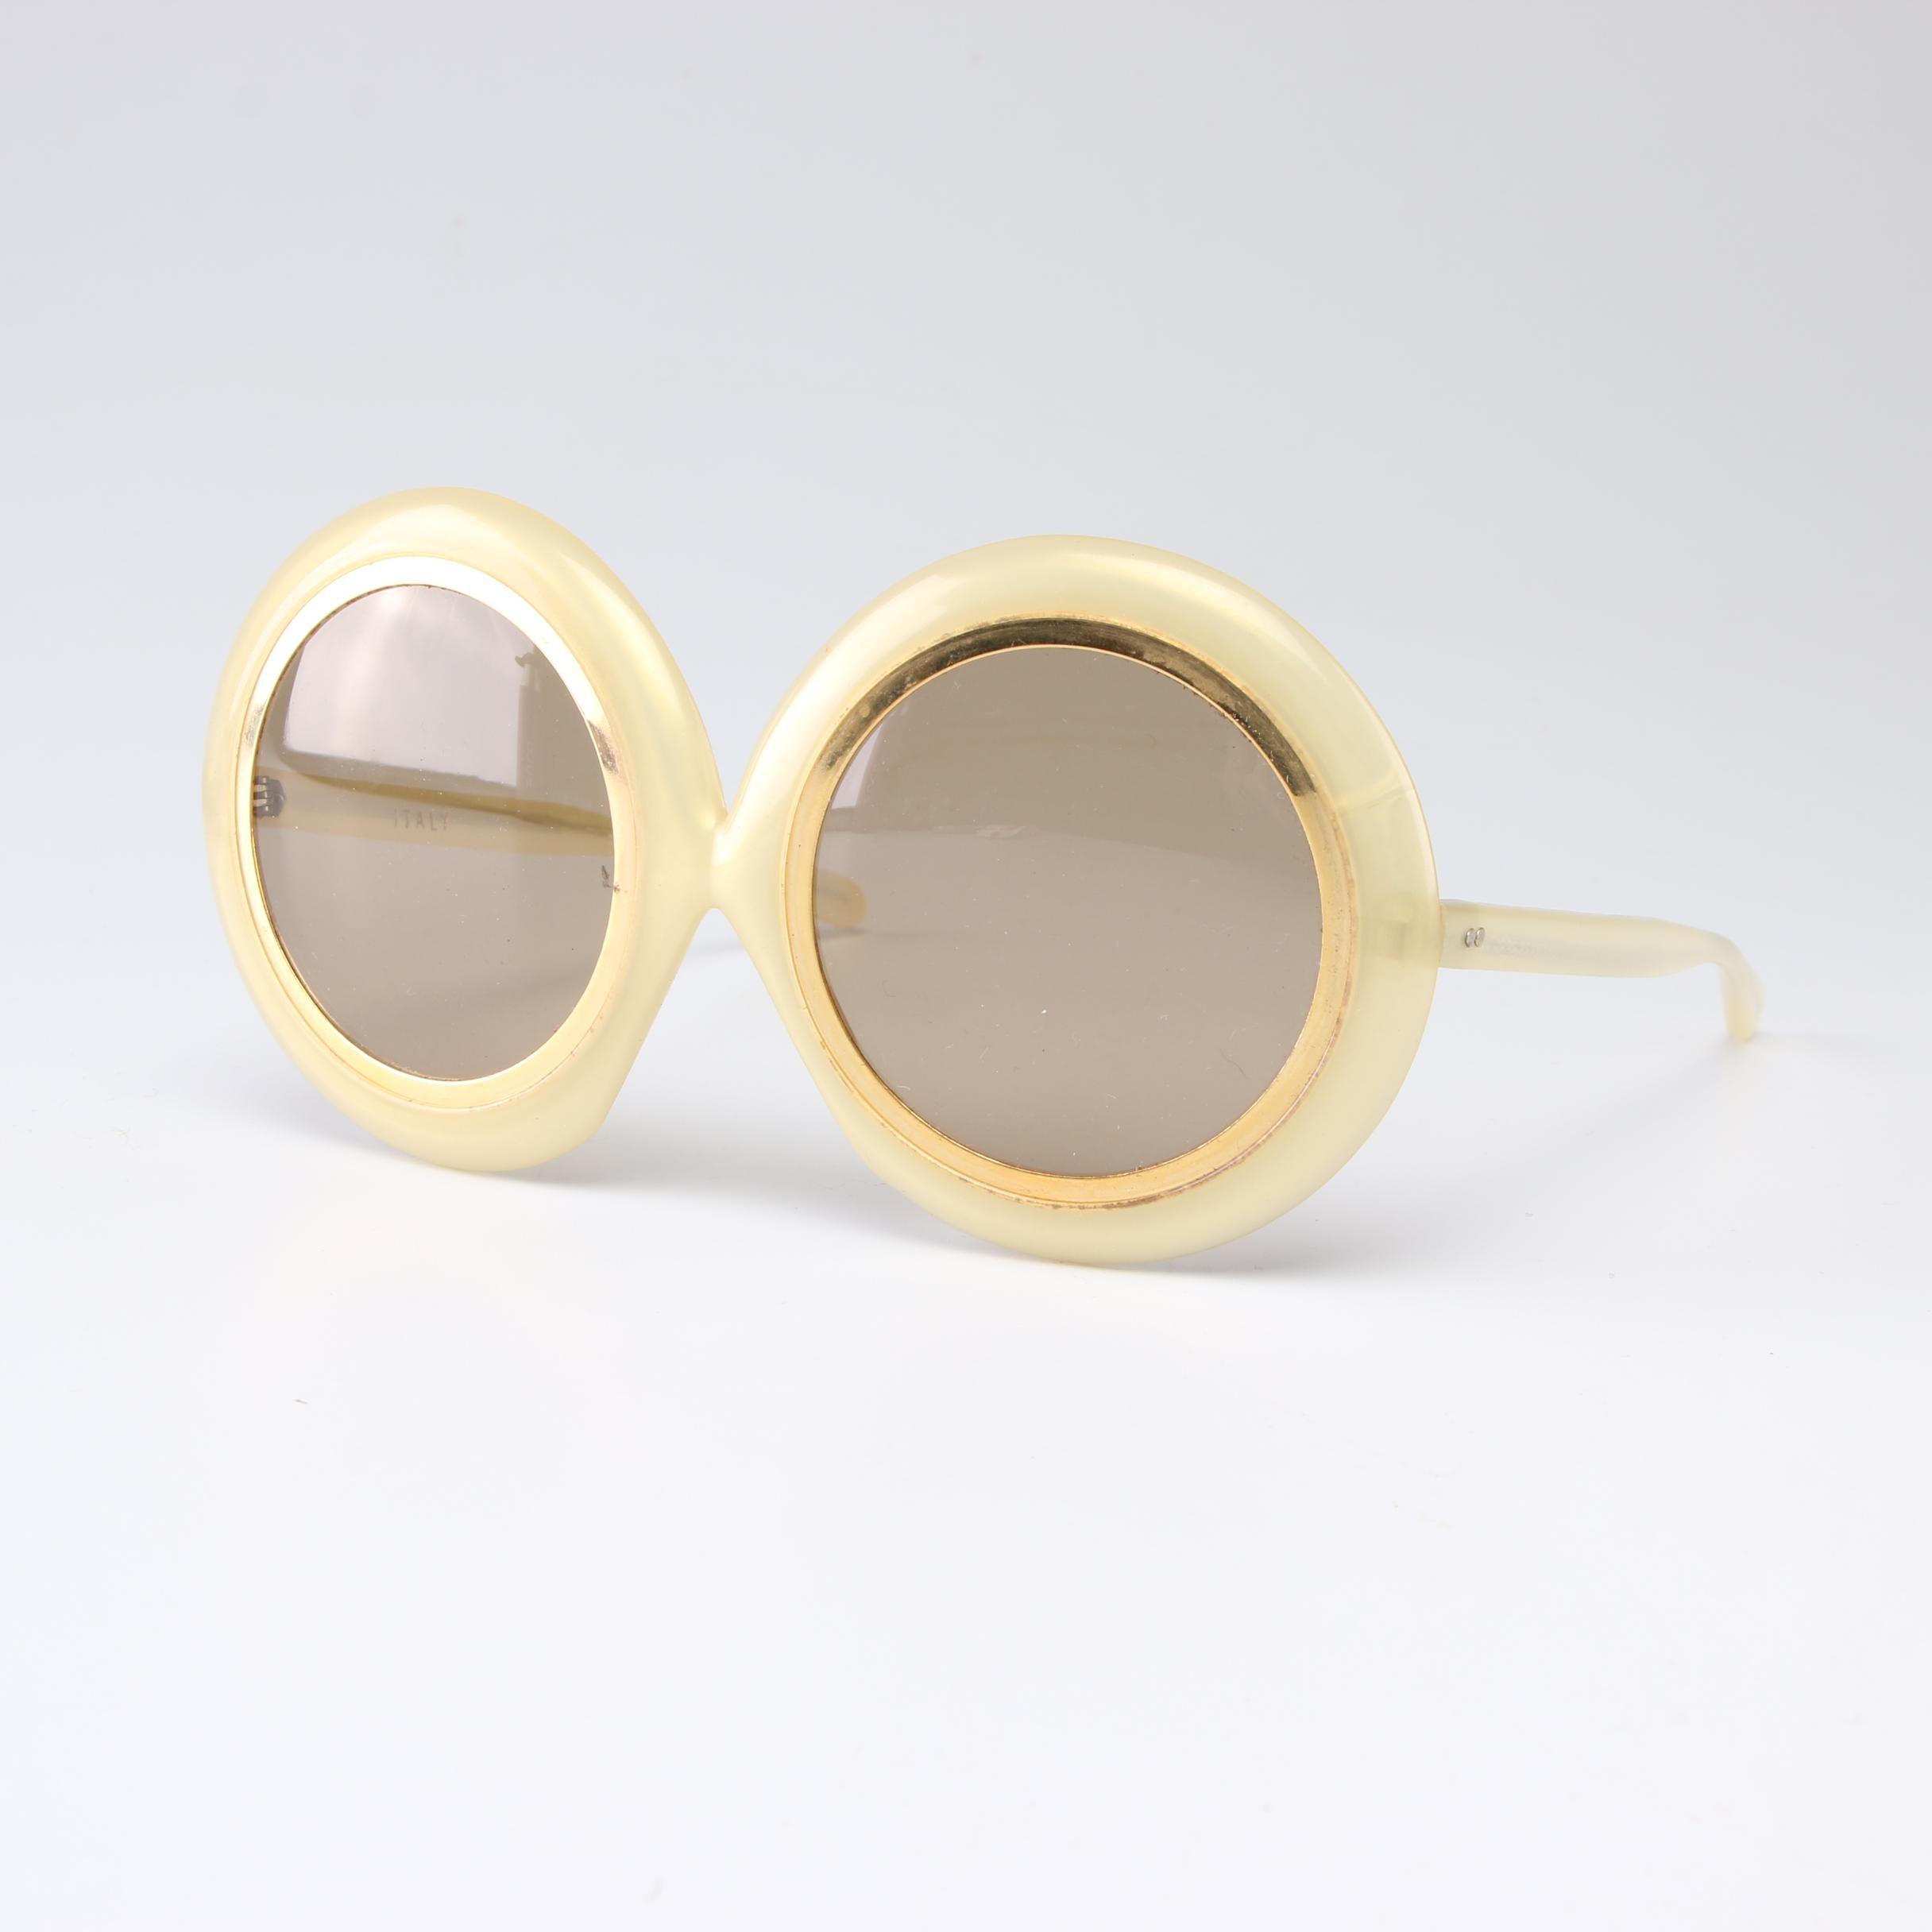 Italian Round Sunglasses, 1960s Vintage